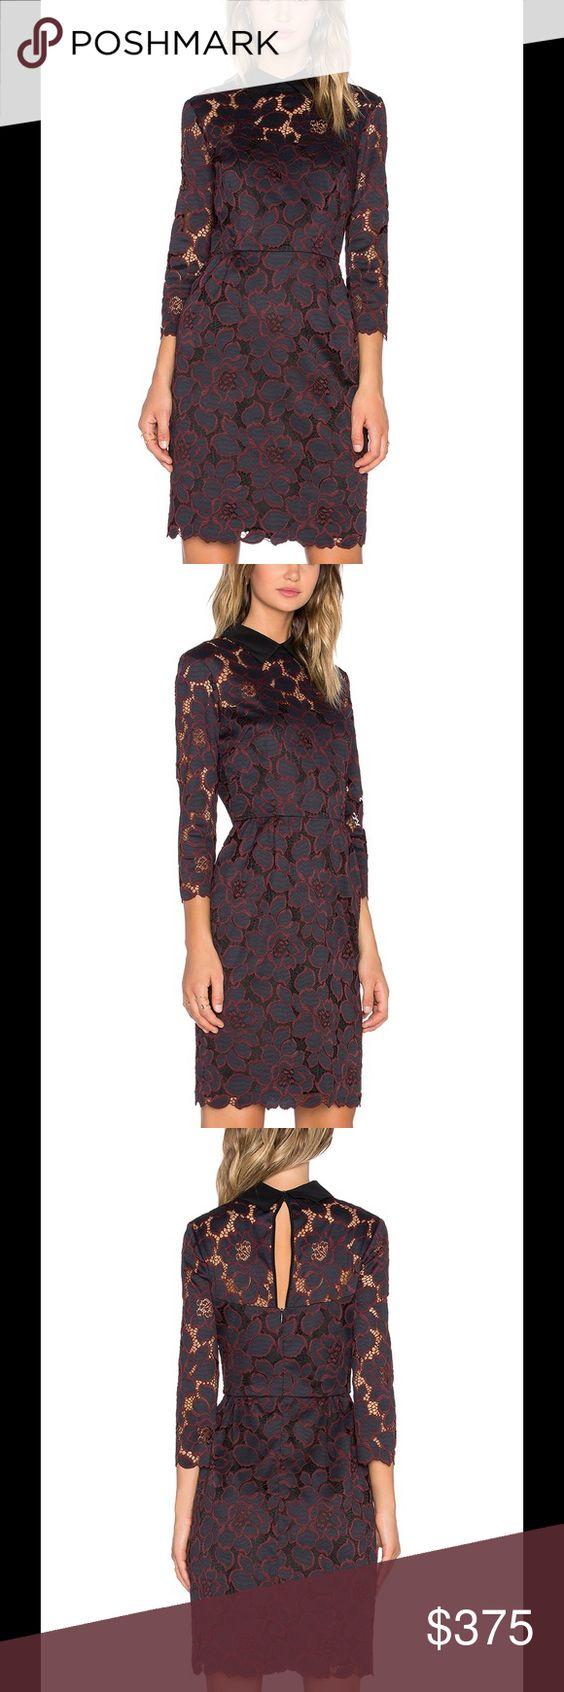 Selling this Trina Turk Killian Mini Dress on Poshmark! My username is: sheerbli55. #shopmycloset #poshmark #fashion #shopping #style #forsale #Trina Turk #Dresses & Skirts